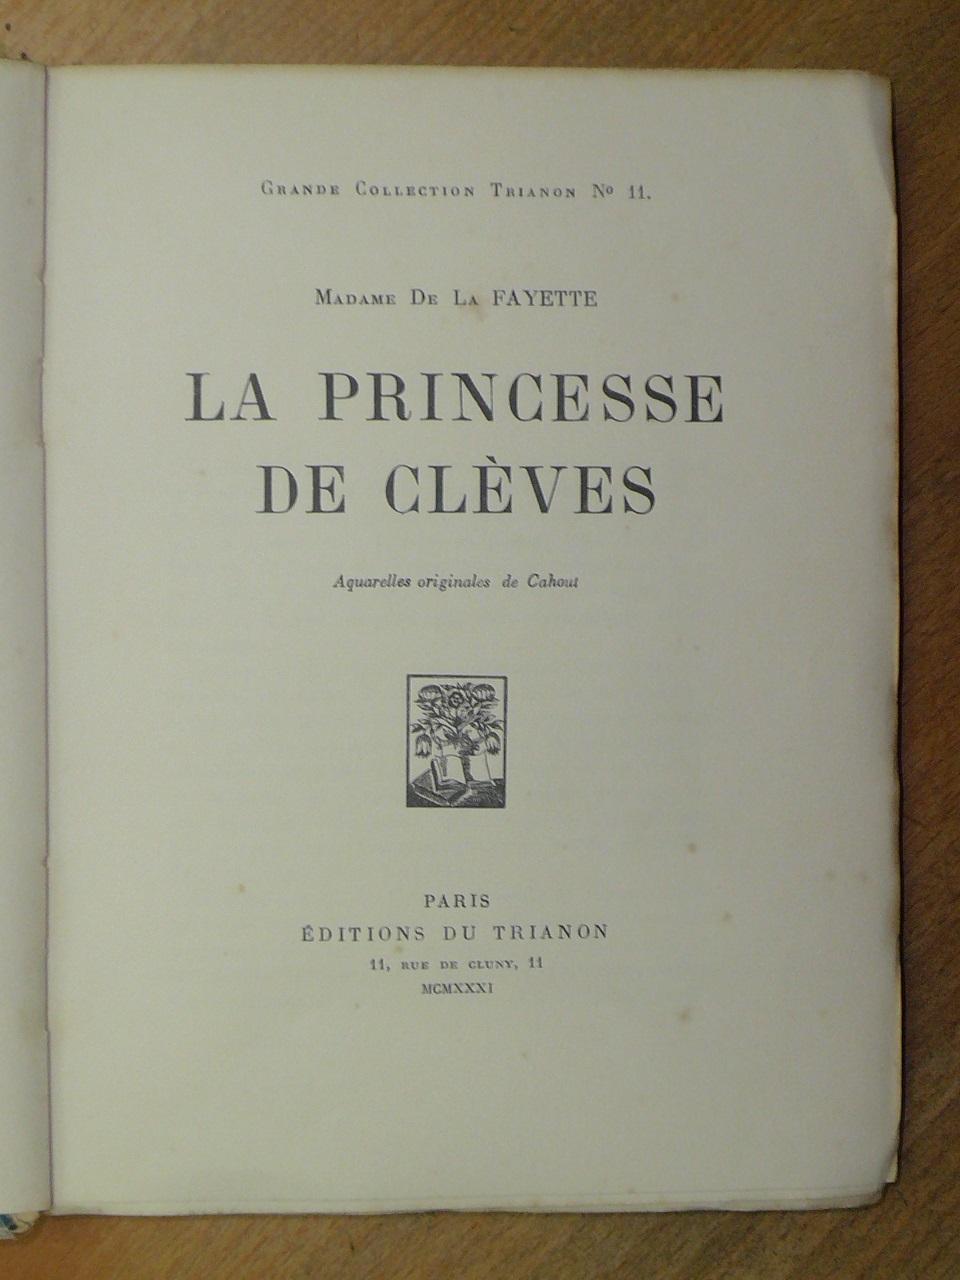 La princesse de clèves - Editions du Trianon